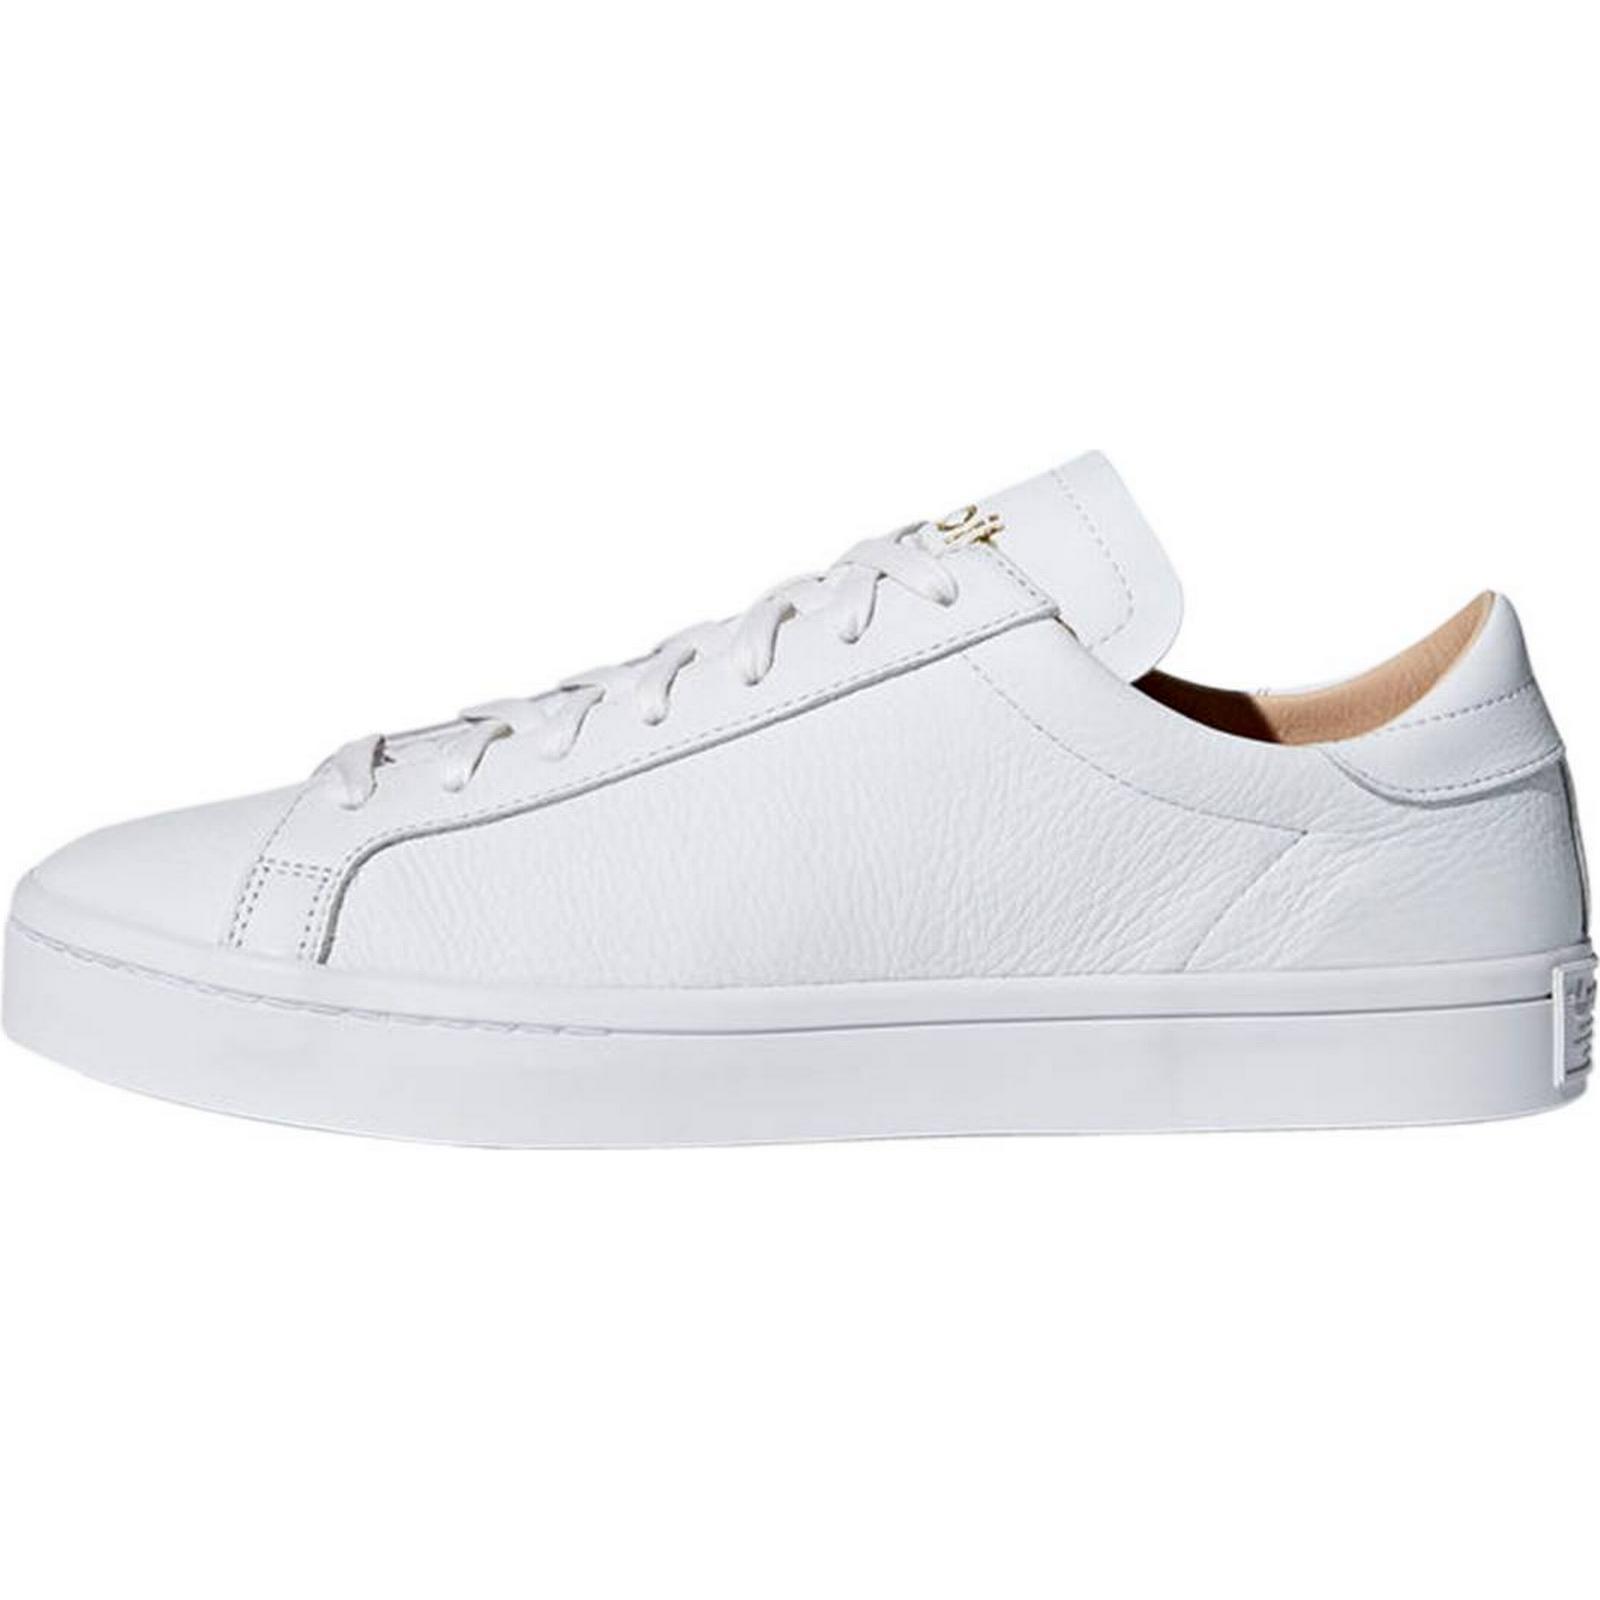 Adidas Court Vantage Vantage Vantage - Wit e0e0b2